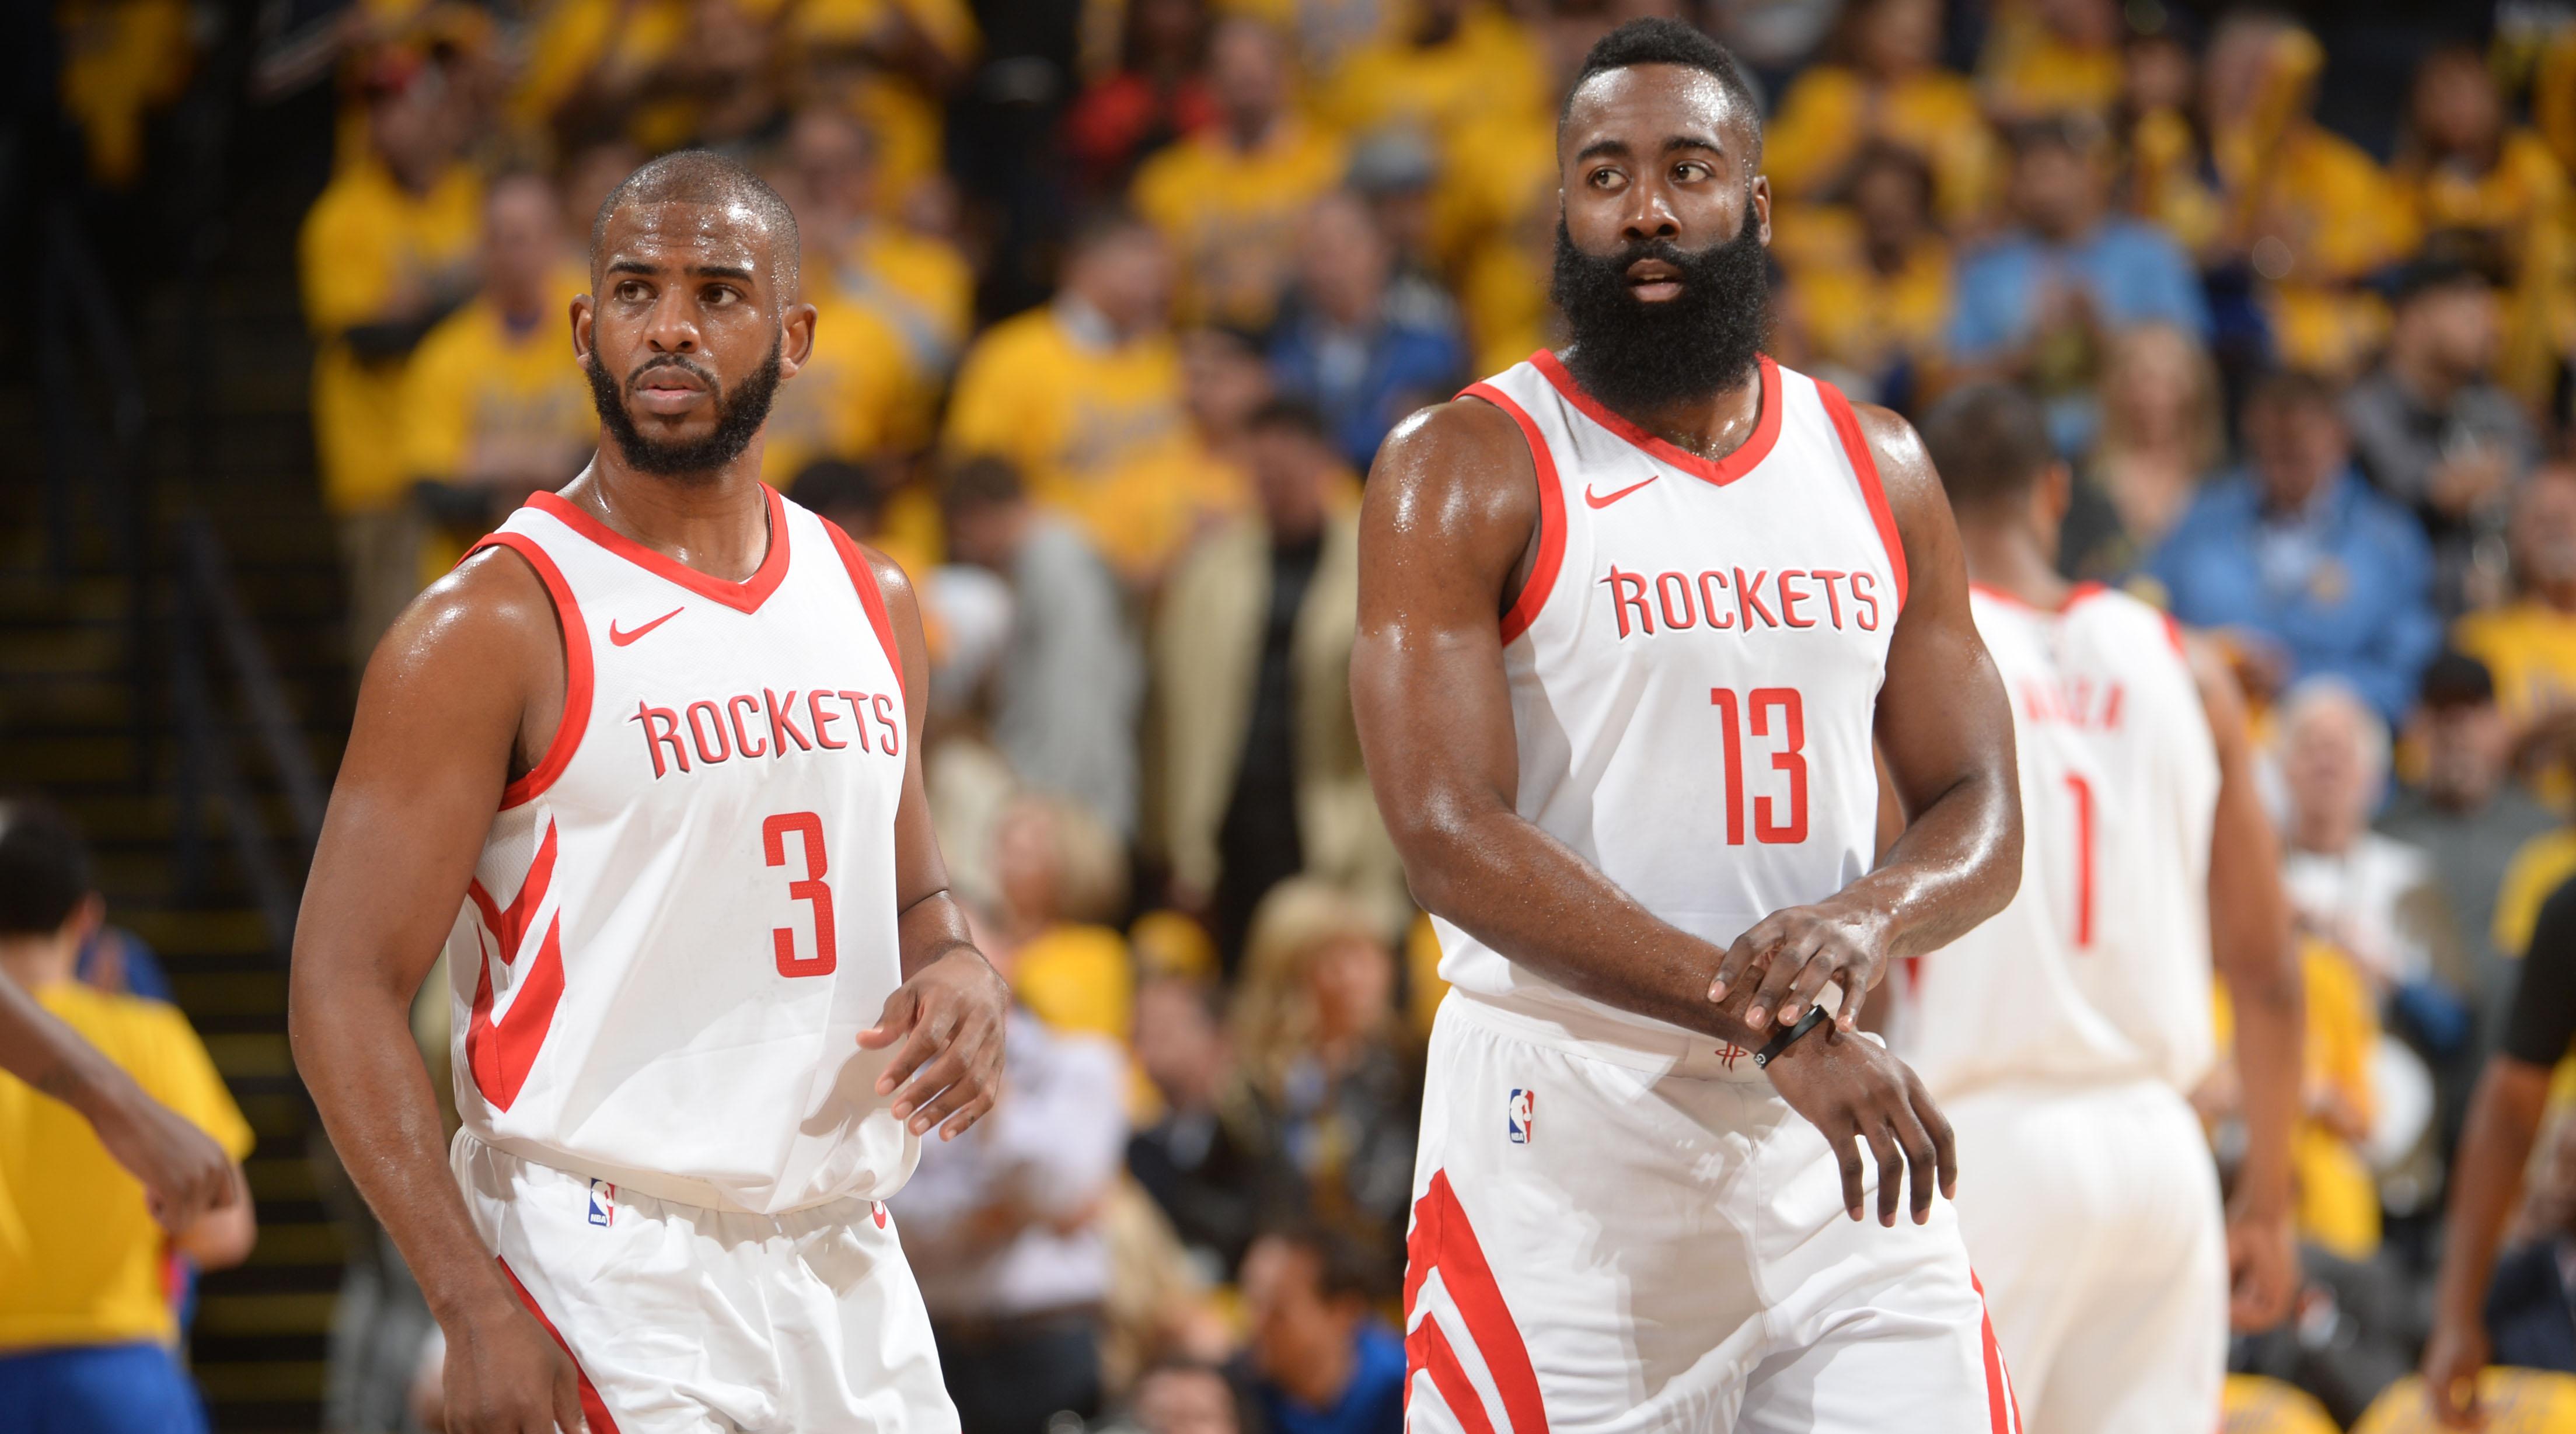 Five stats that represent the Rockets' sluggish start | SI.com